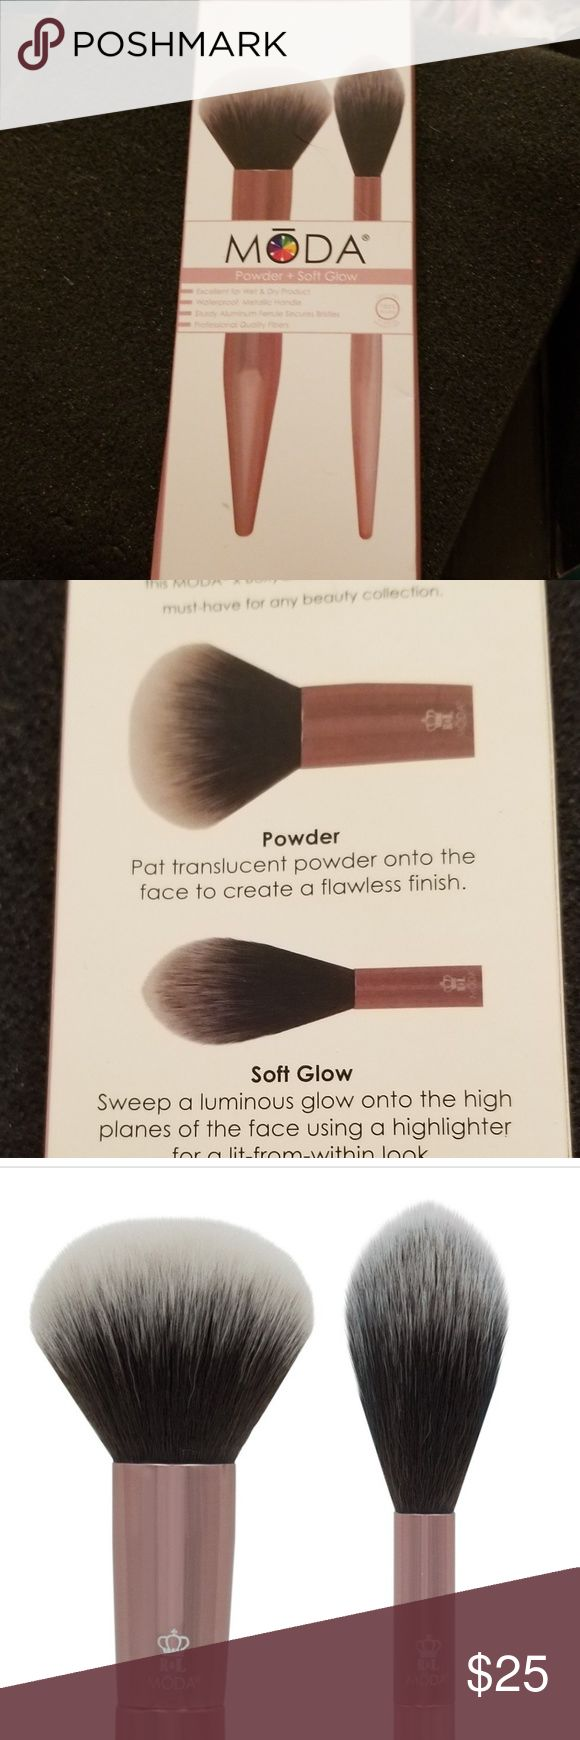 BNIB Moda Brush Duo Brush, Makeup tools brushes, Moda